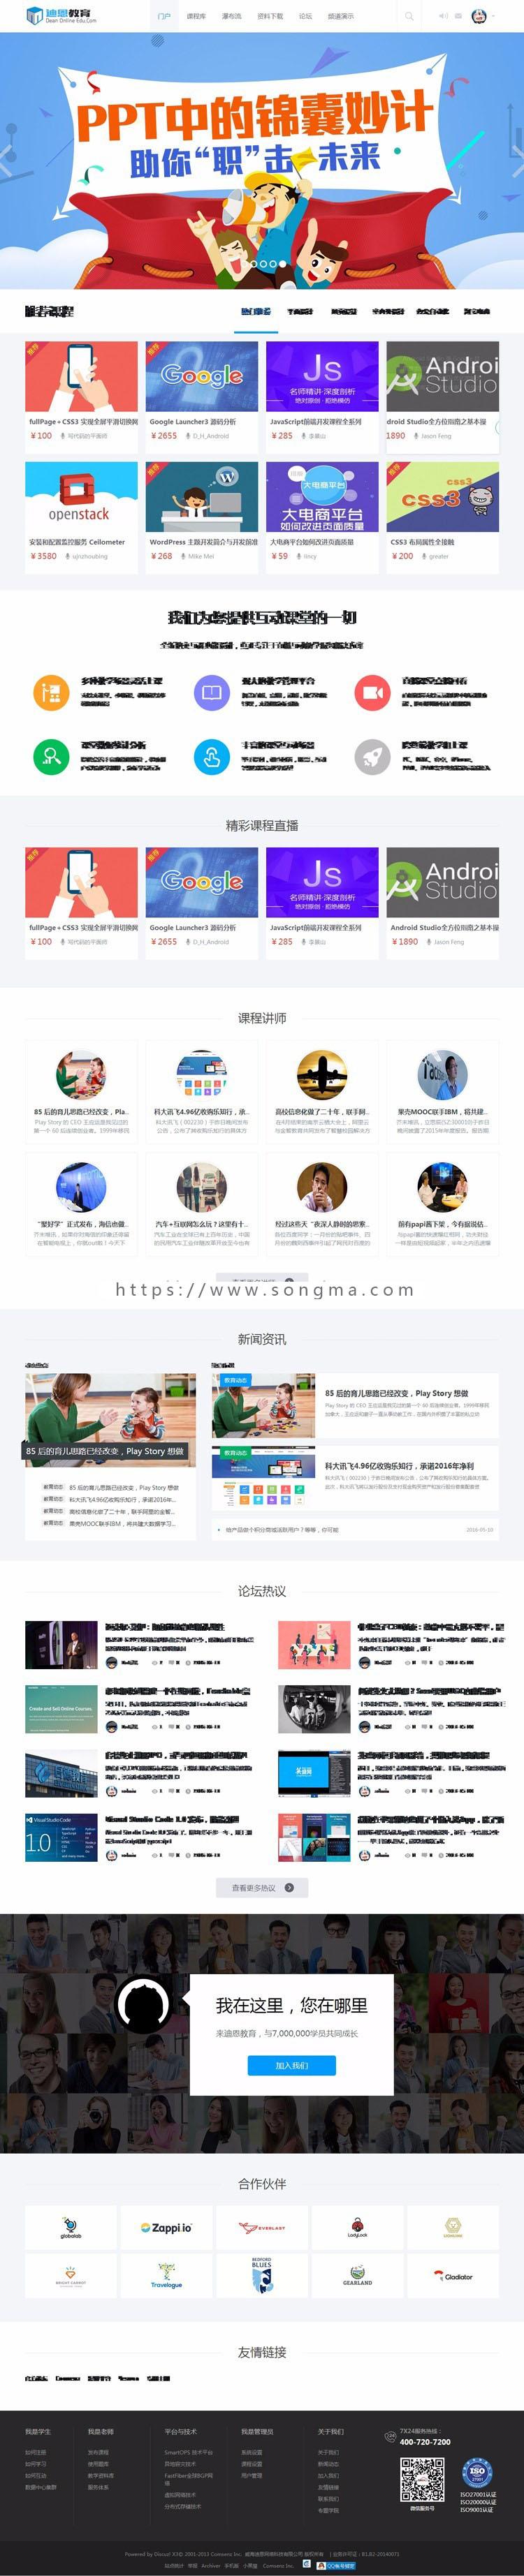 discuz模板 在线教育视频学习技能培训商业版在线教育课程网校模版 dz模板